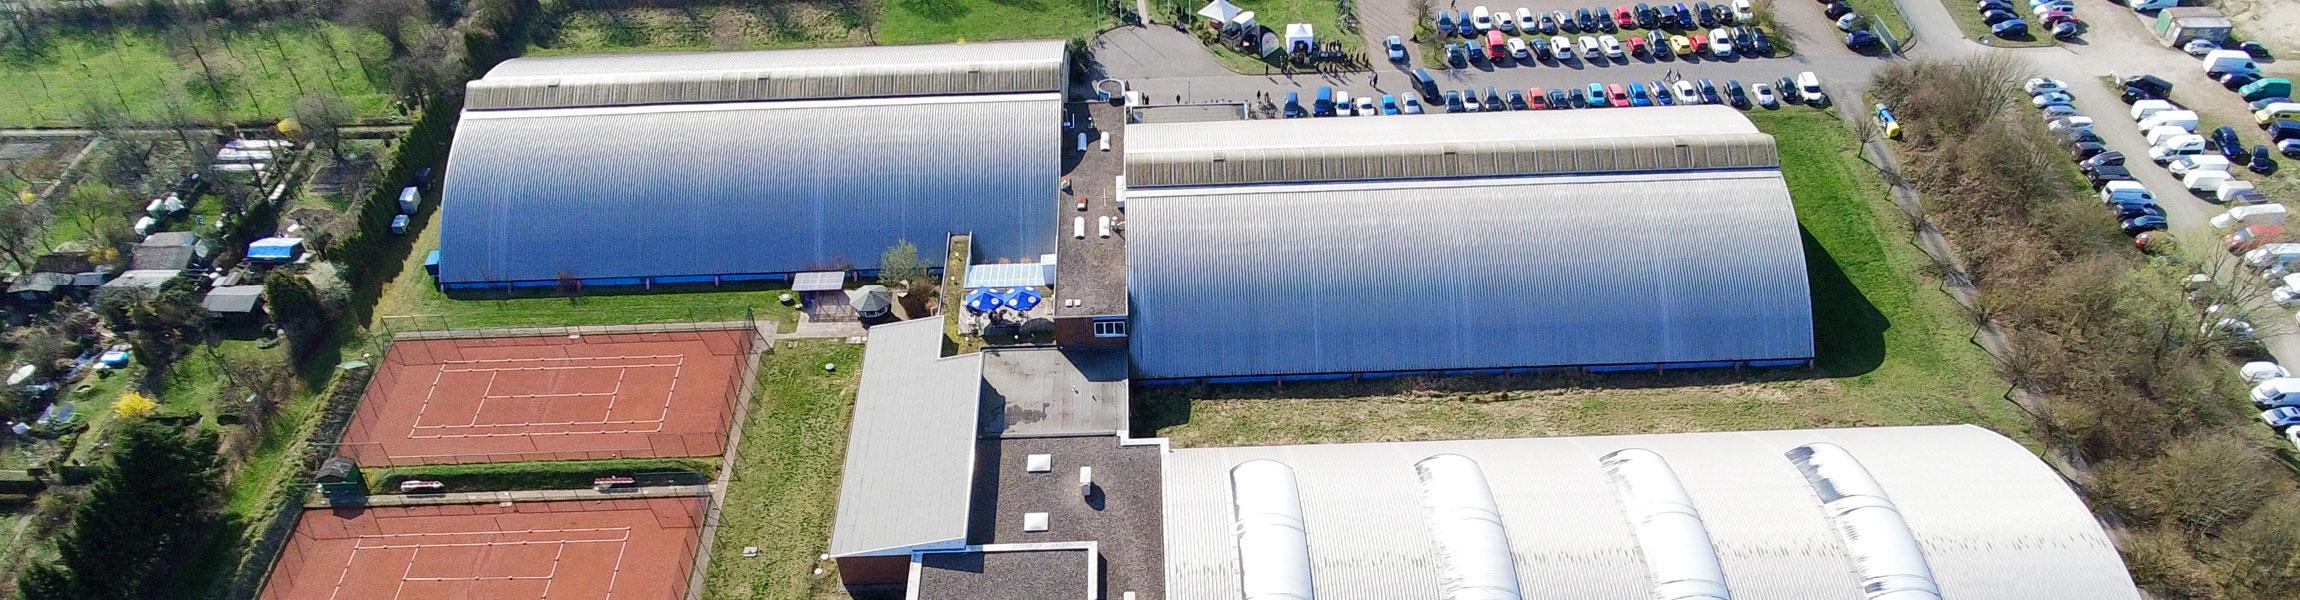 sportpark-kreideberg-sportzentrum